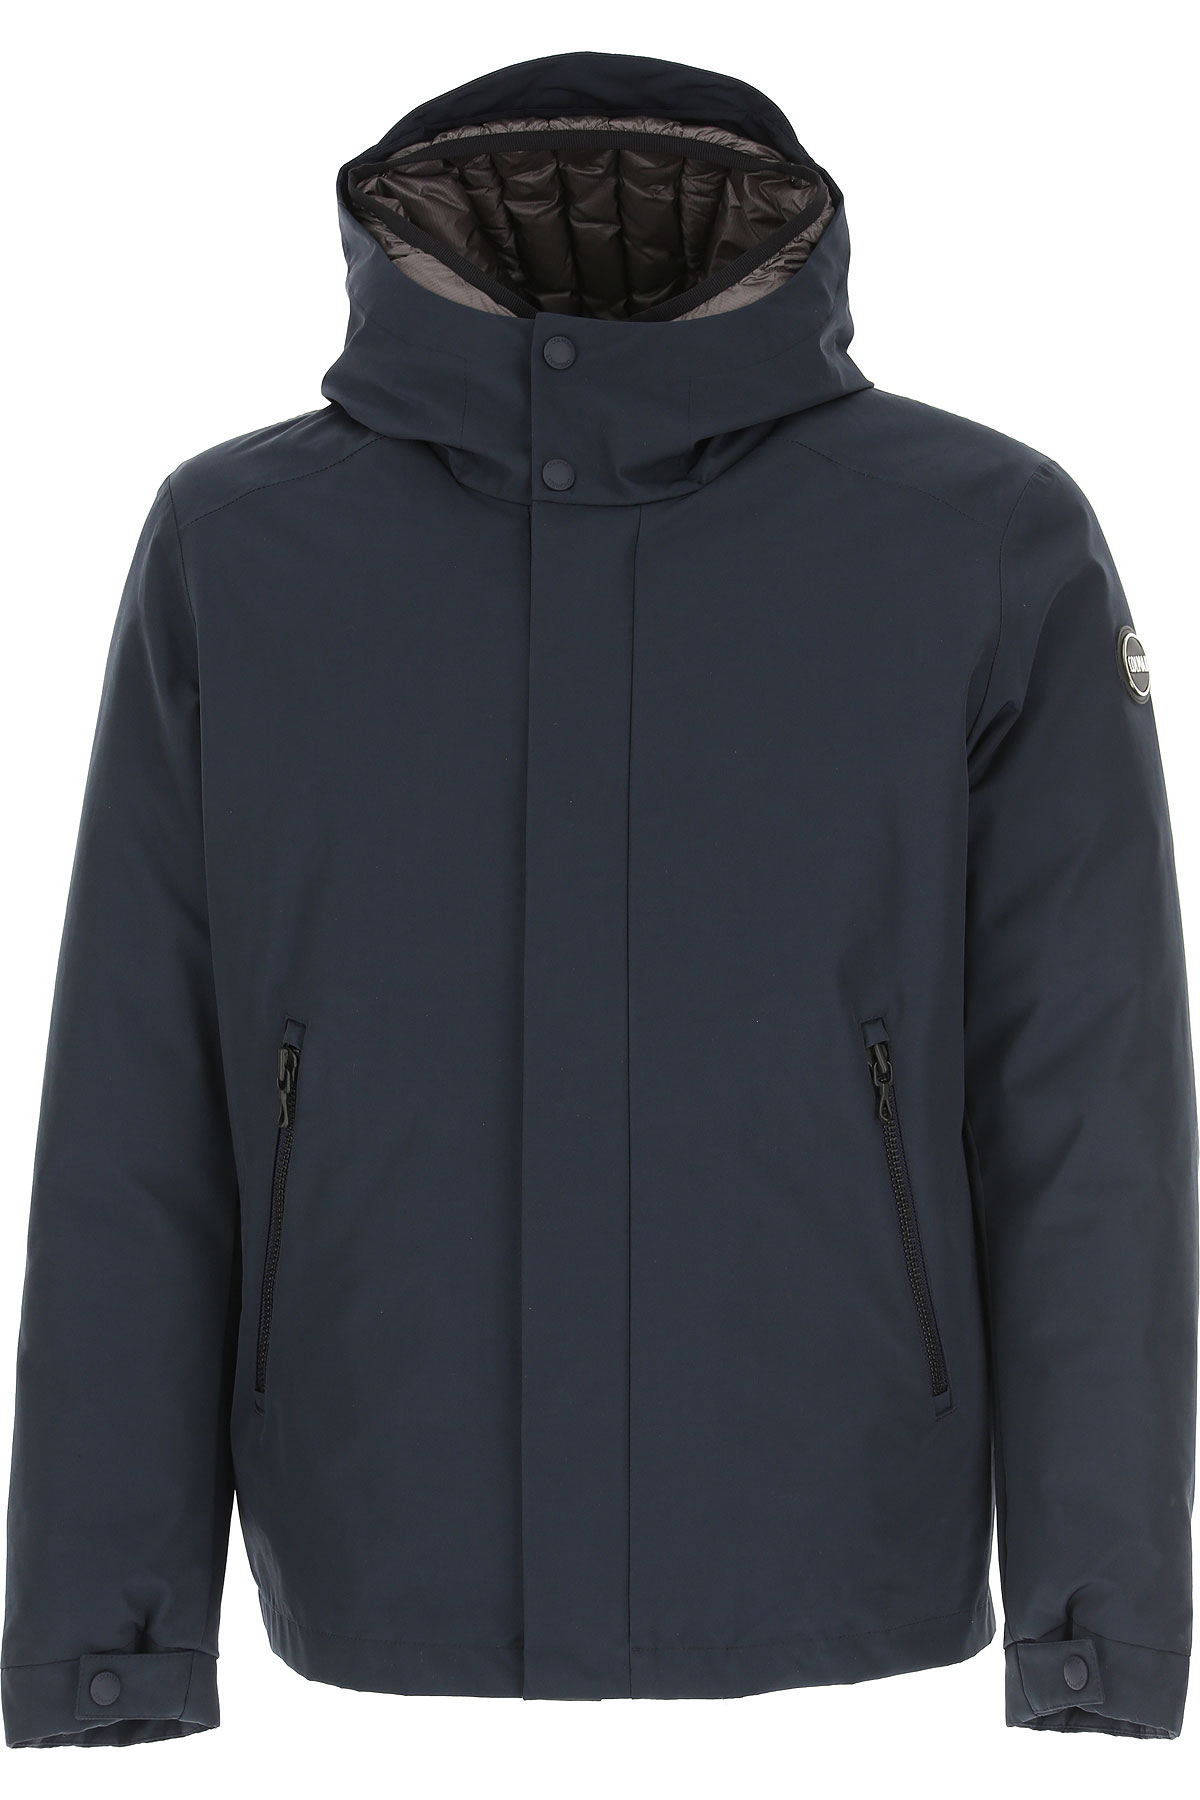 Colmar Down Jacket for Men, Puffer Ski Jacket On Sale, Navy Blue, Down, 2019, L M XL XXL